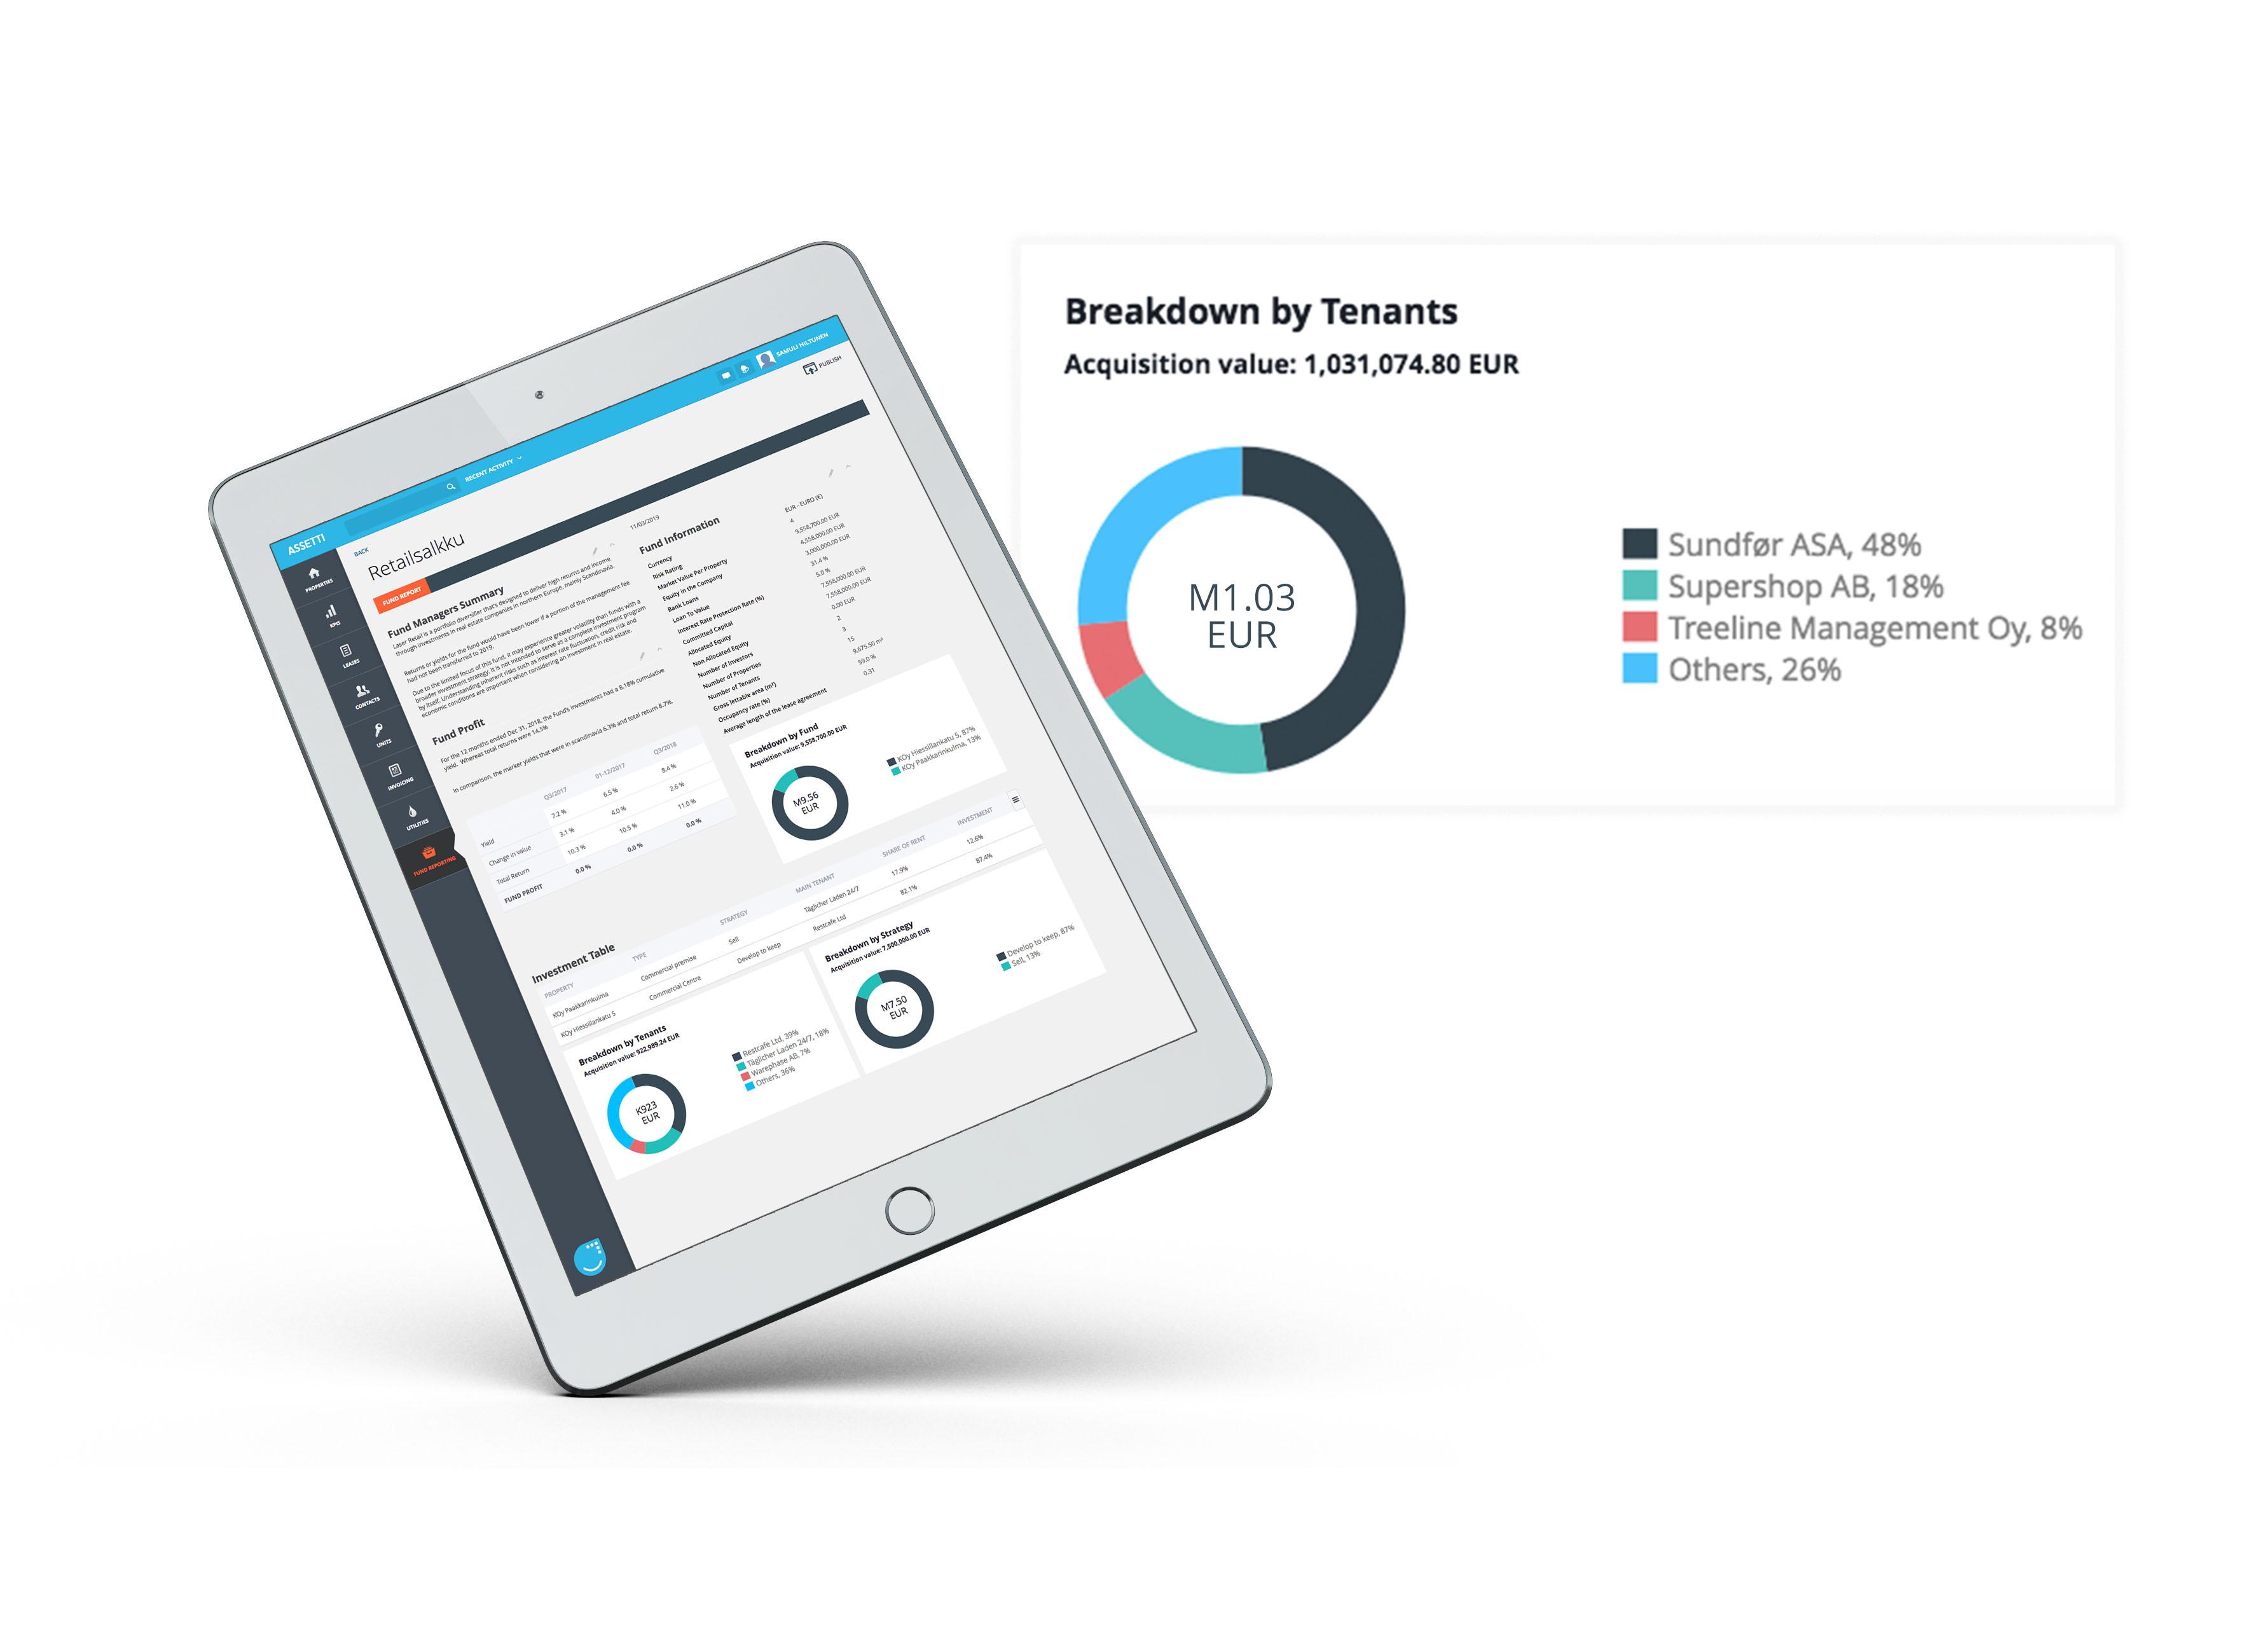 automatisoitu ja visualisoitu rahastoraportointi